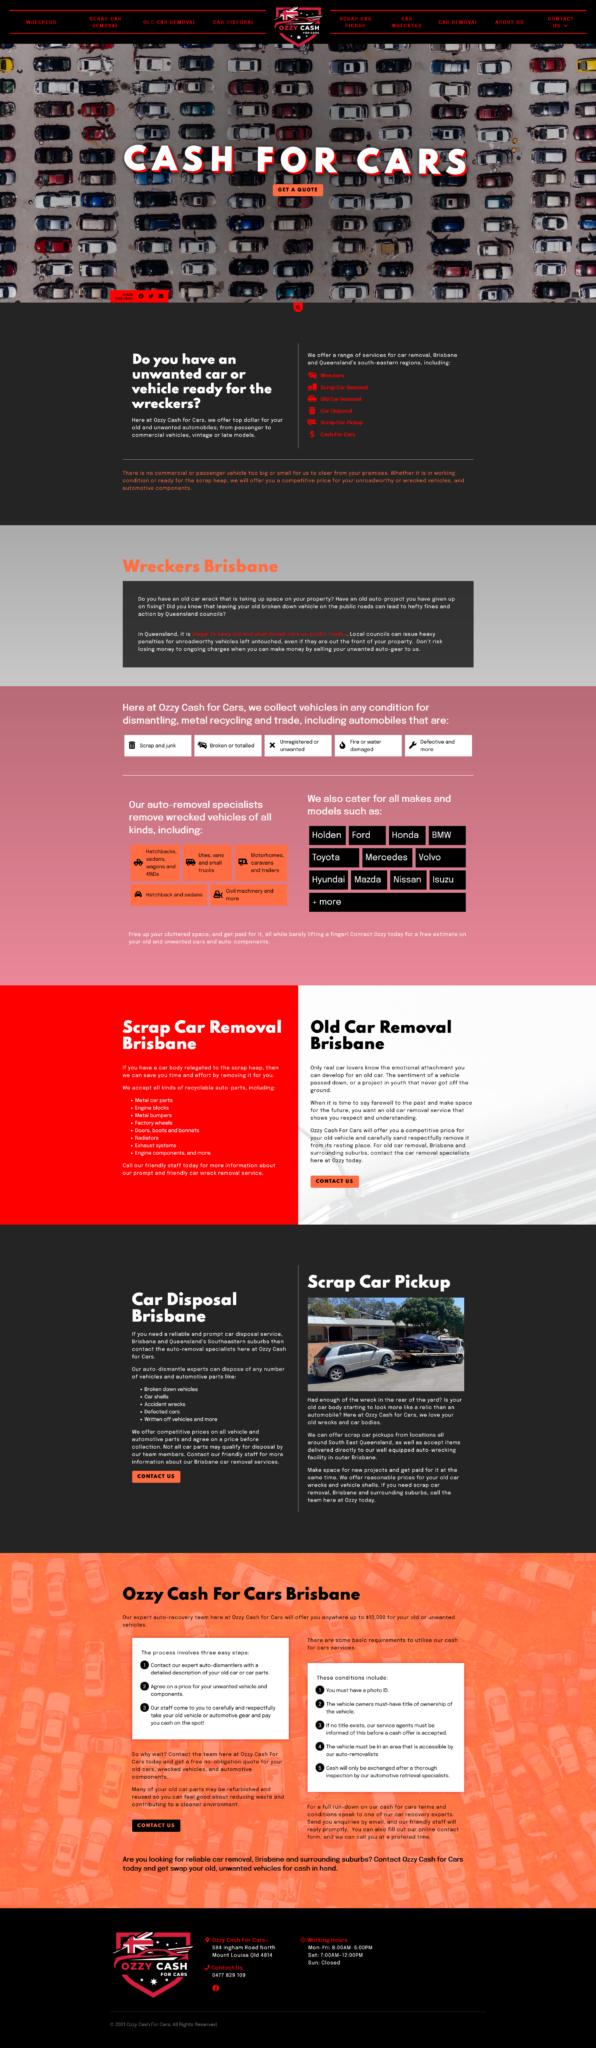 Ozzy cash for cars: Desktop View